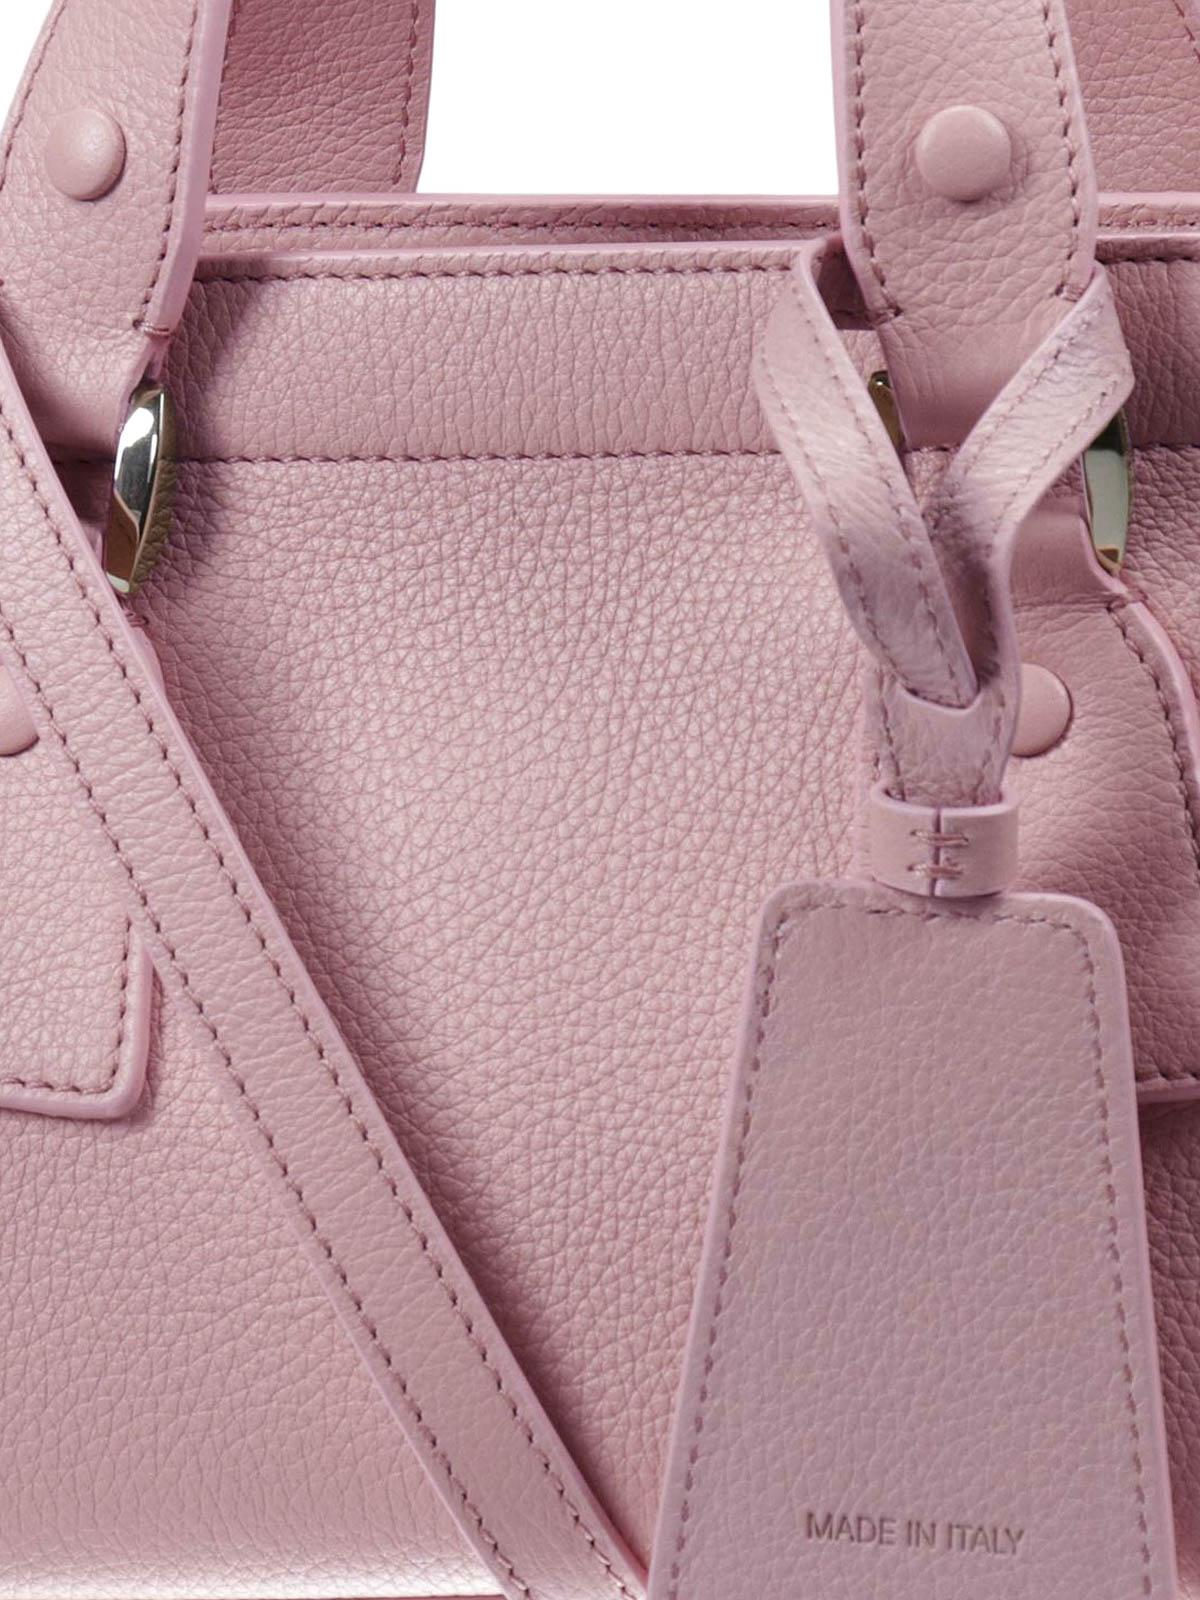 Giorgio Armani - Le Sac 11 small bag - cross body bags - Y1D044 YD47E f8ebf8b5528